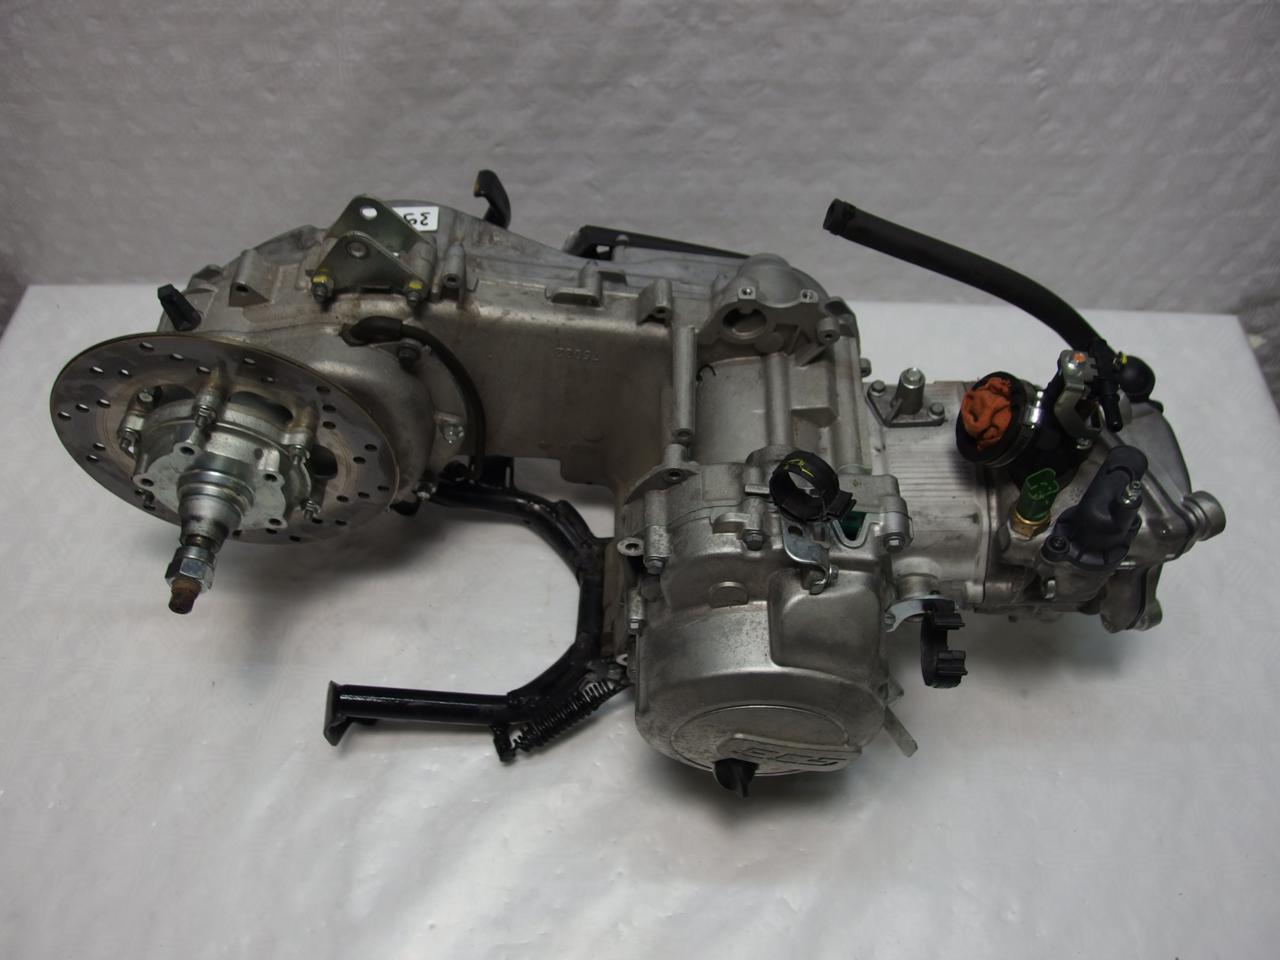 vespa gts 300 125 gtv gt 200 250 gtl motor mit malossi 209 cc tuning kit ebay